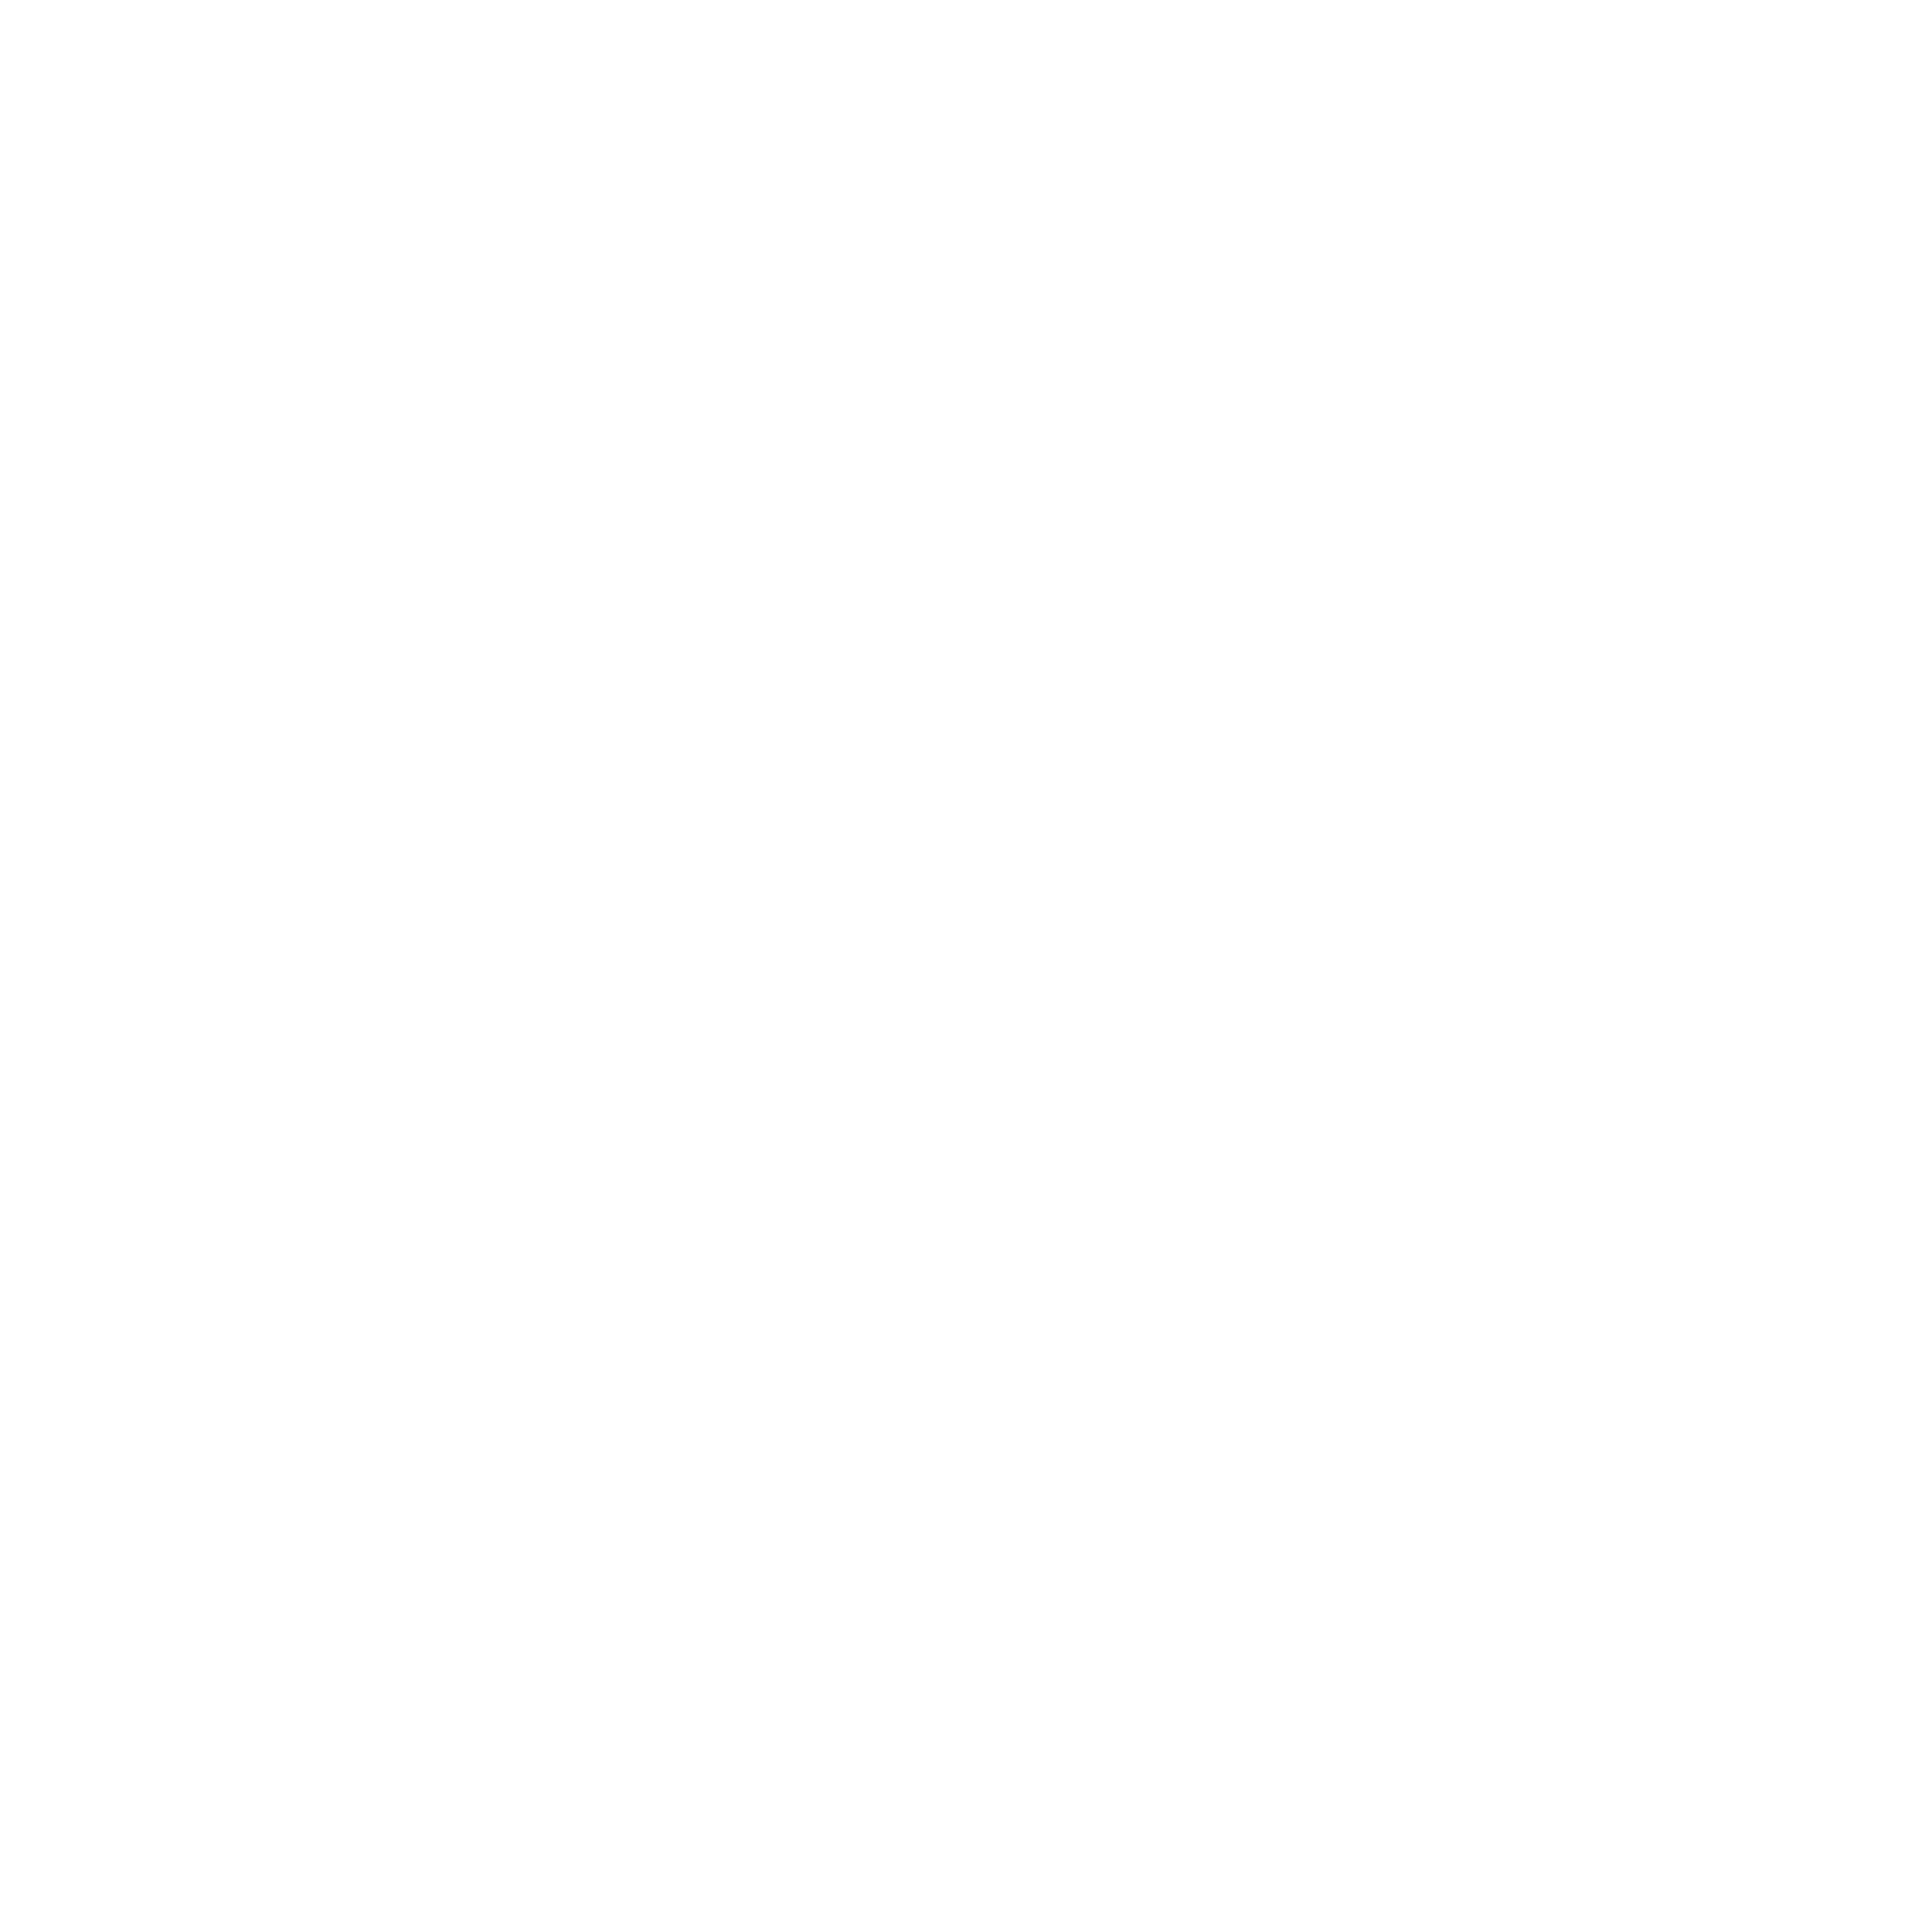 Border transparent image gallery. White circle frame png